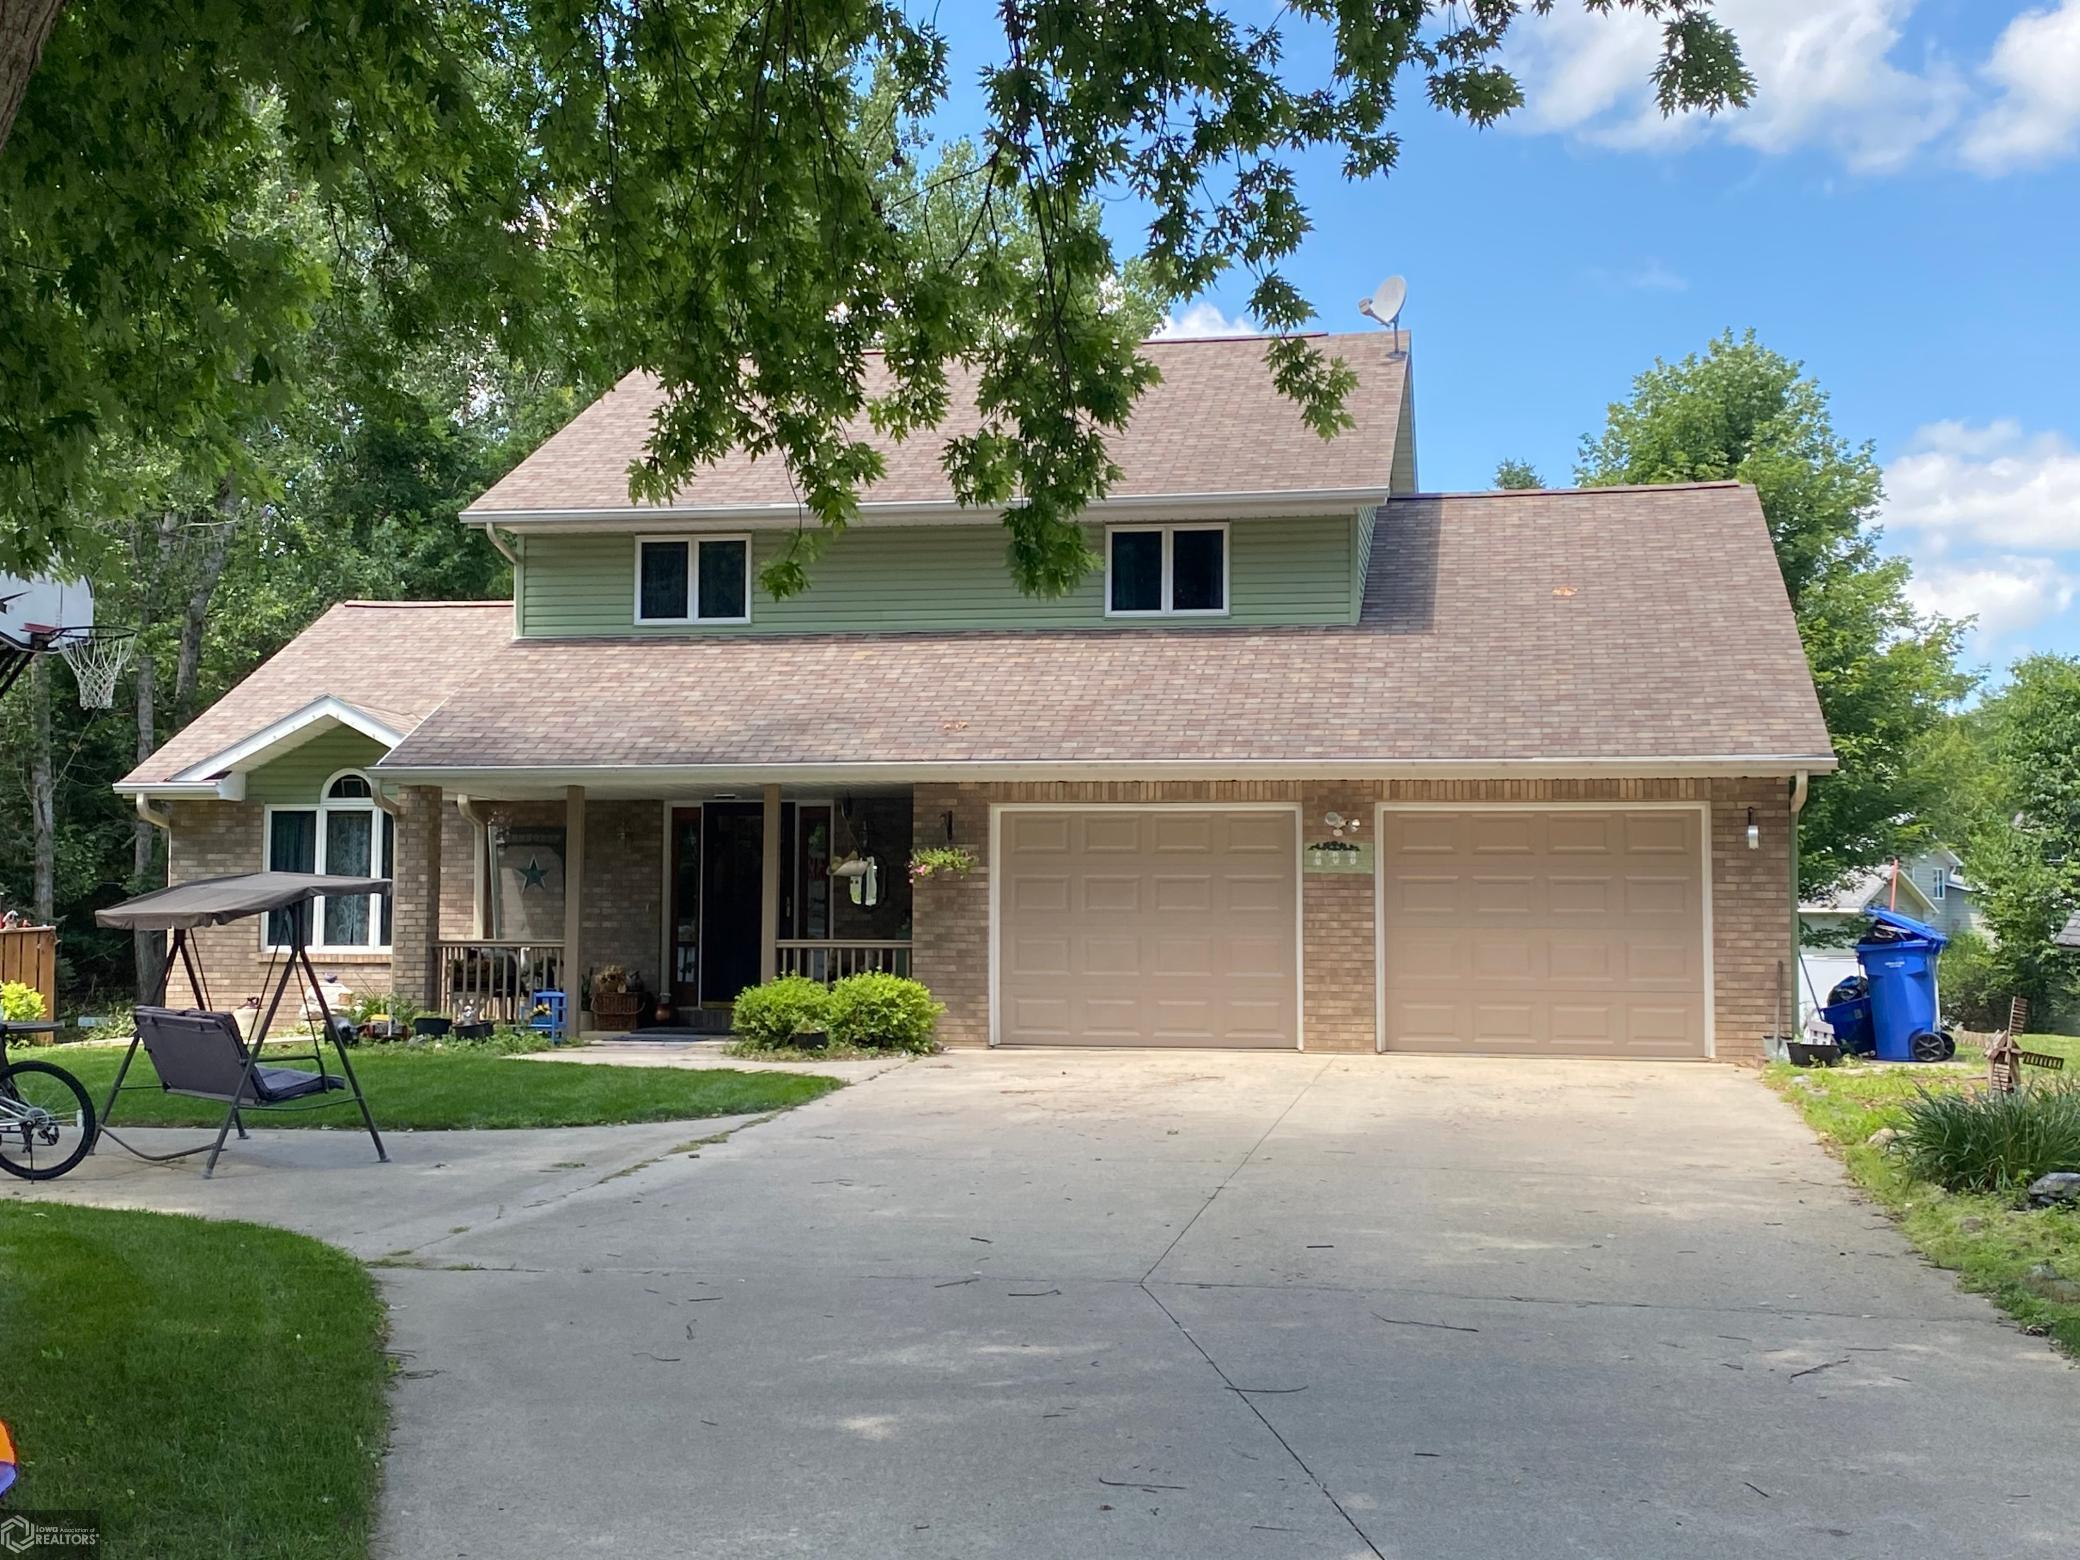 808 Smith Property Photo - Algona, IA real estate listing